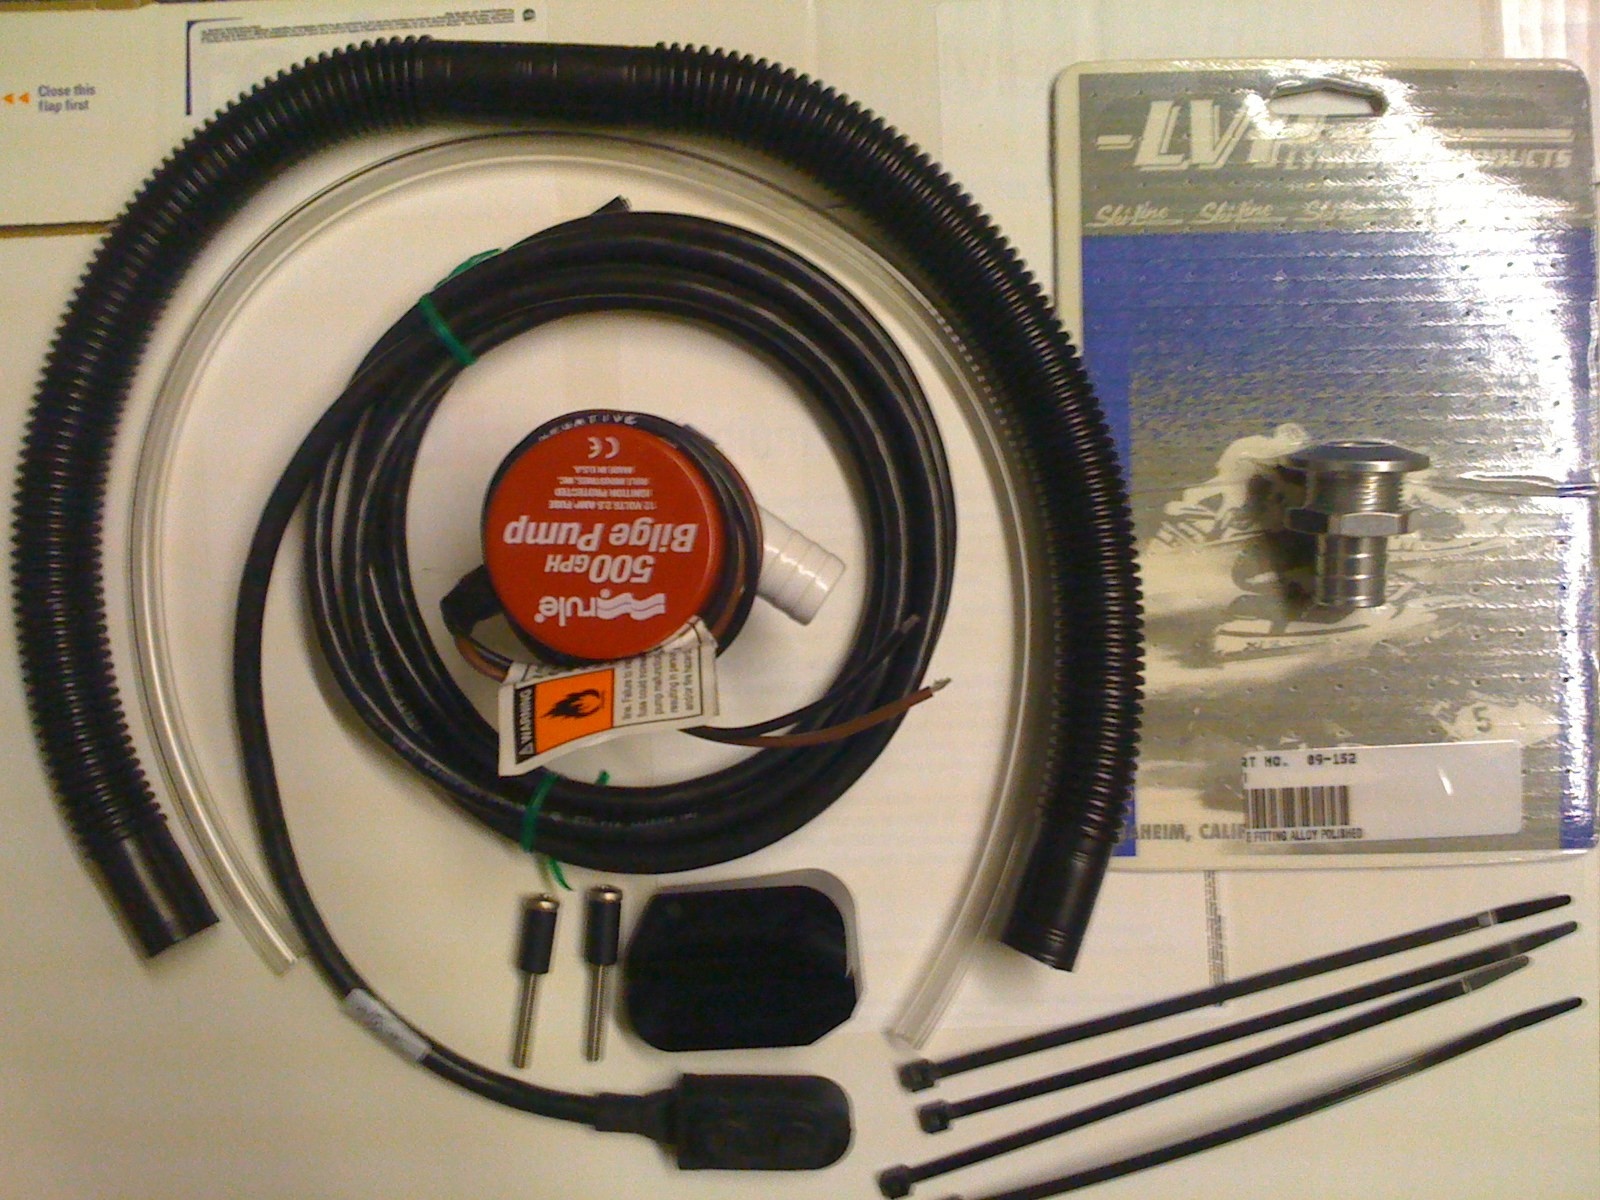 Wire Bilge Pump Kits Center Rule 750 Wiring Moreover Automatic Diagram Yamaha 96 701 Superjet Waveblaster Kit 12 1172 148 68 Rh Ad Discountperformance Com Manual Ship